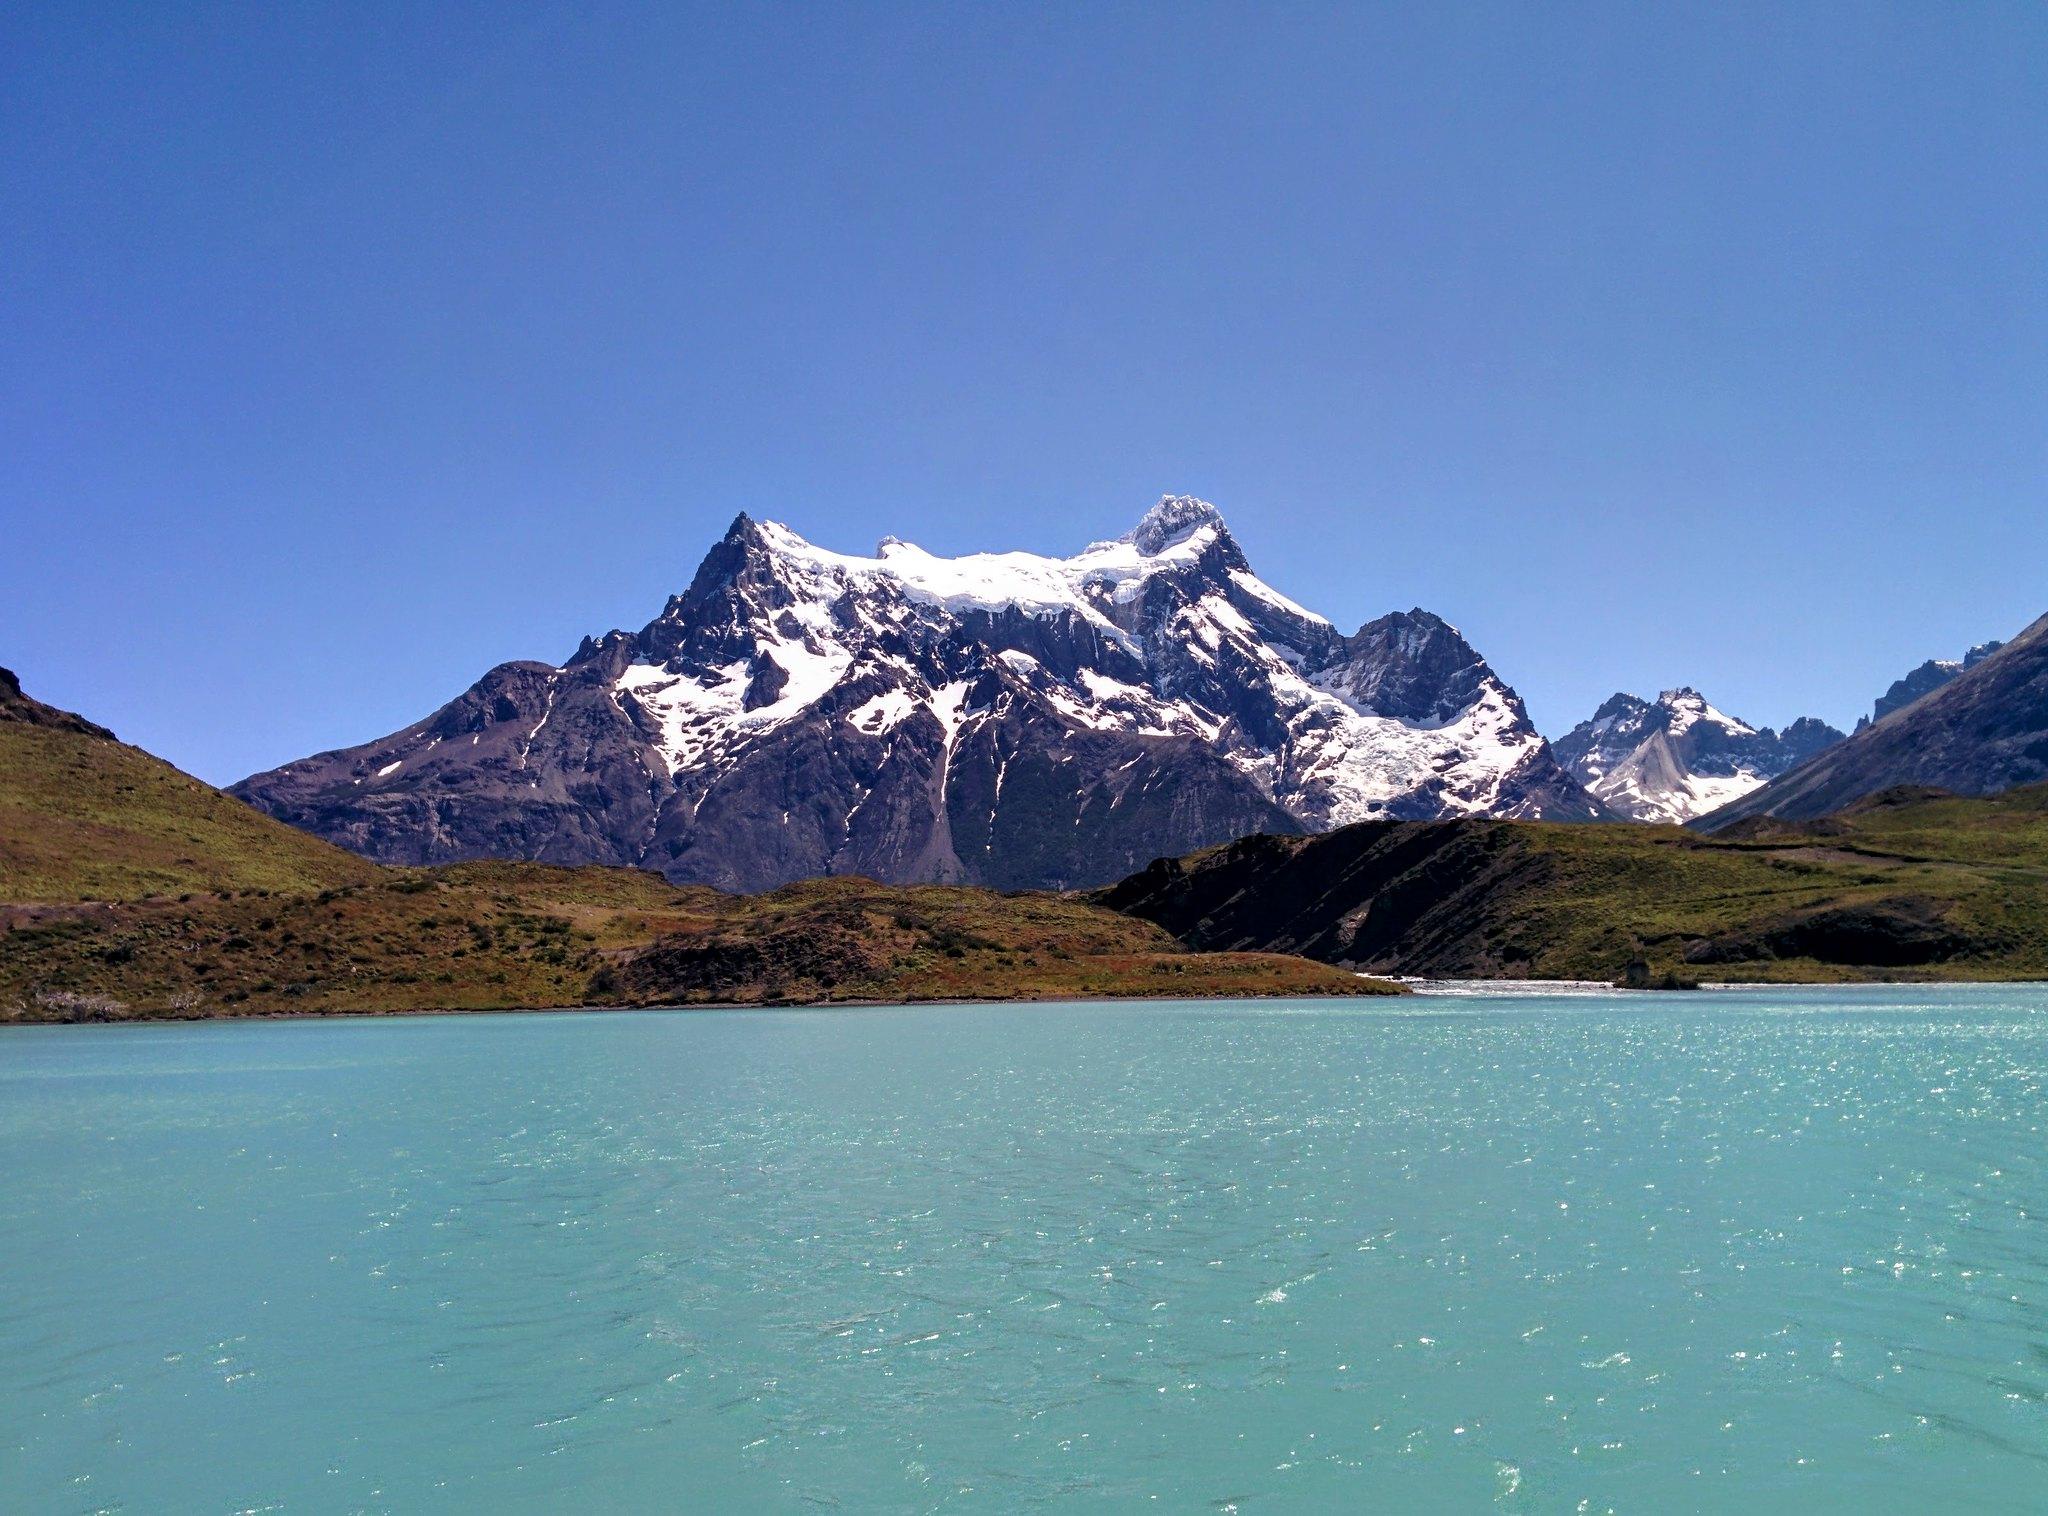 Cordillera Paine from Lago Pehoé